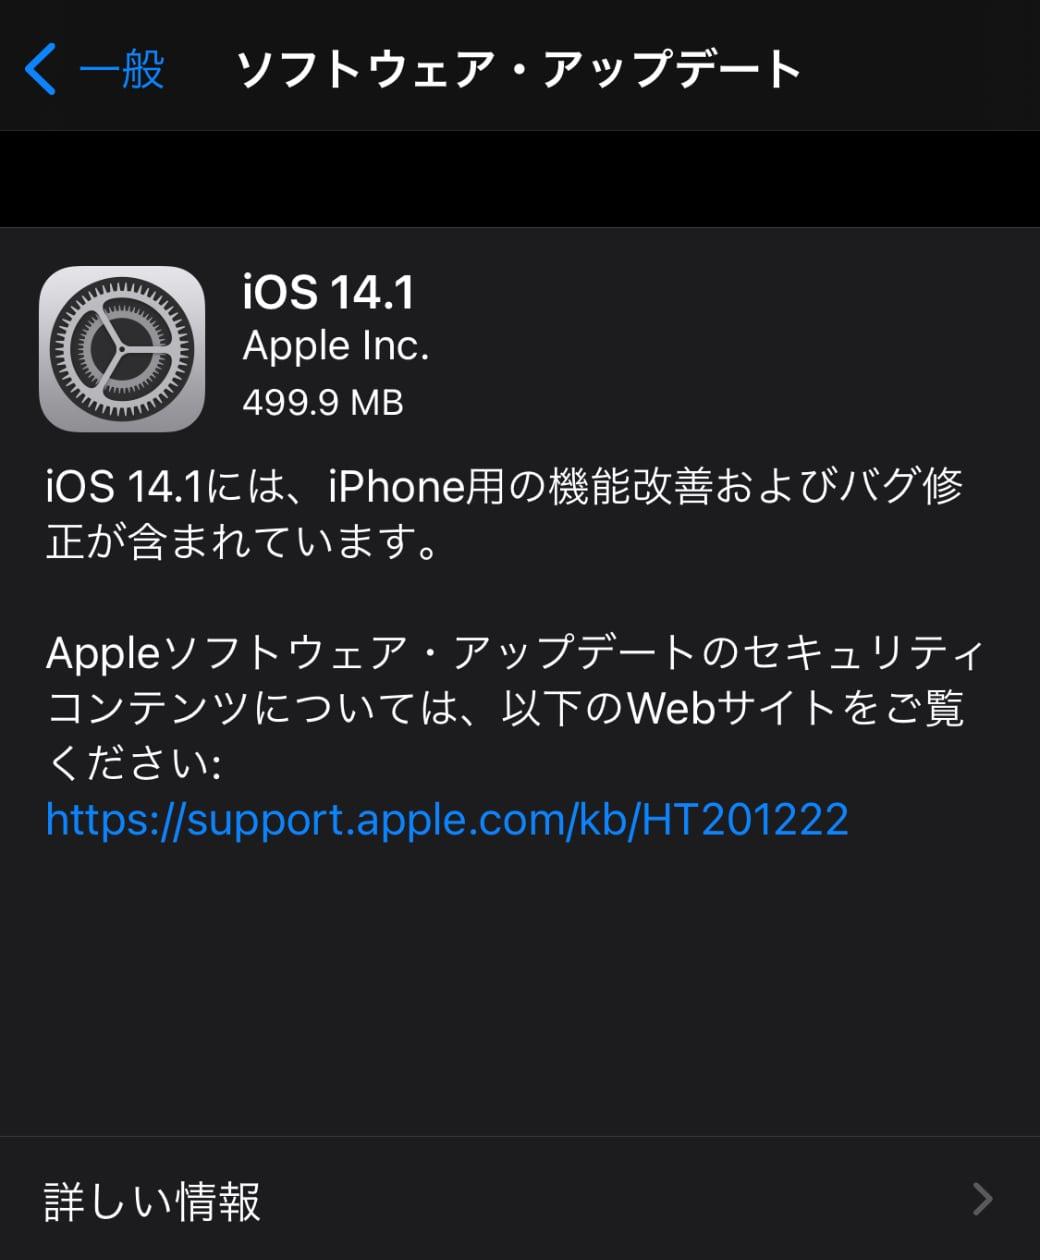 Apple、「iOS 14.1」をリリース ‒ 機能改善とバグ修正